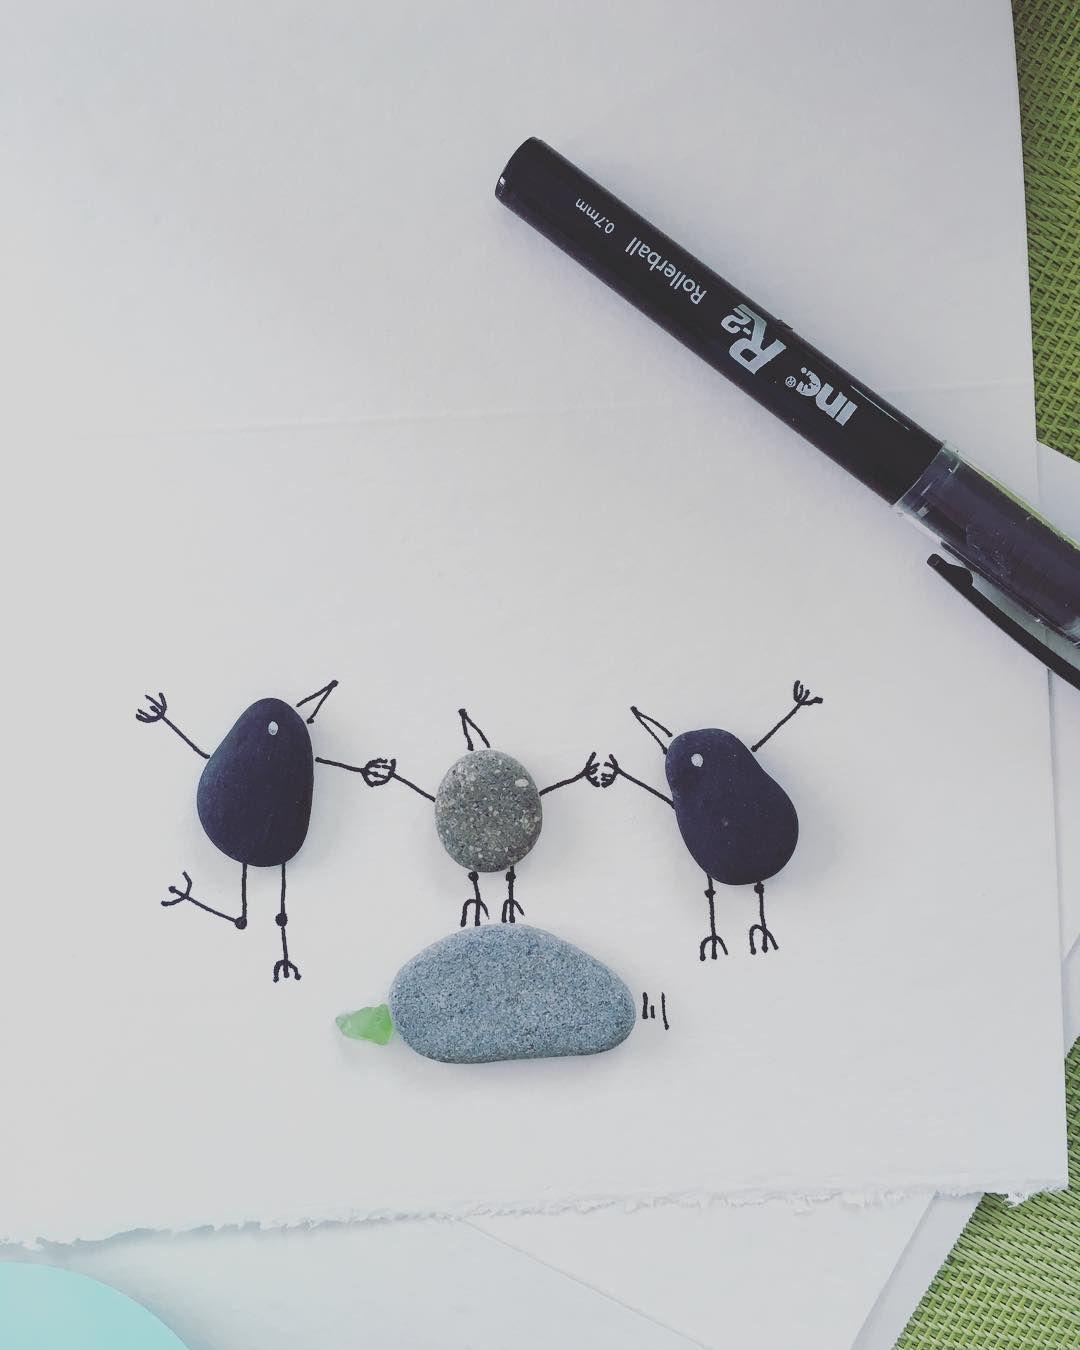 #family #pebbleart #pebblebirds #beachrocks #vanisland #jumpiwillcatchyou #fly #holdinghands #buylocalart #sidneybeaches #seaglass